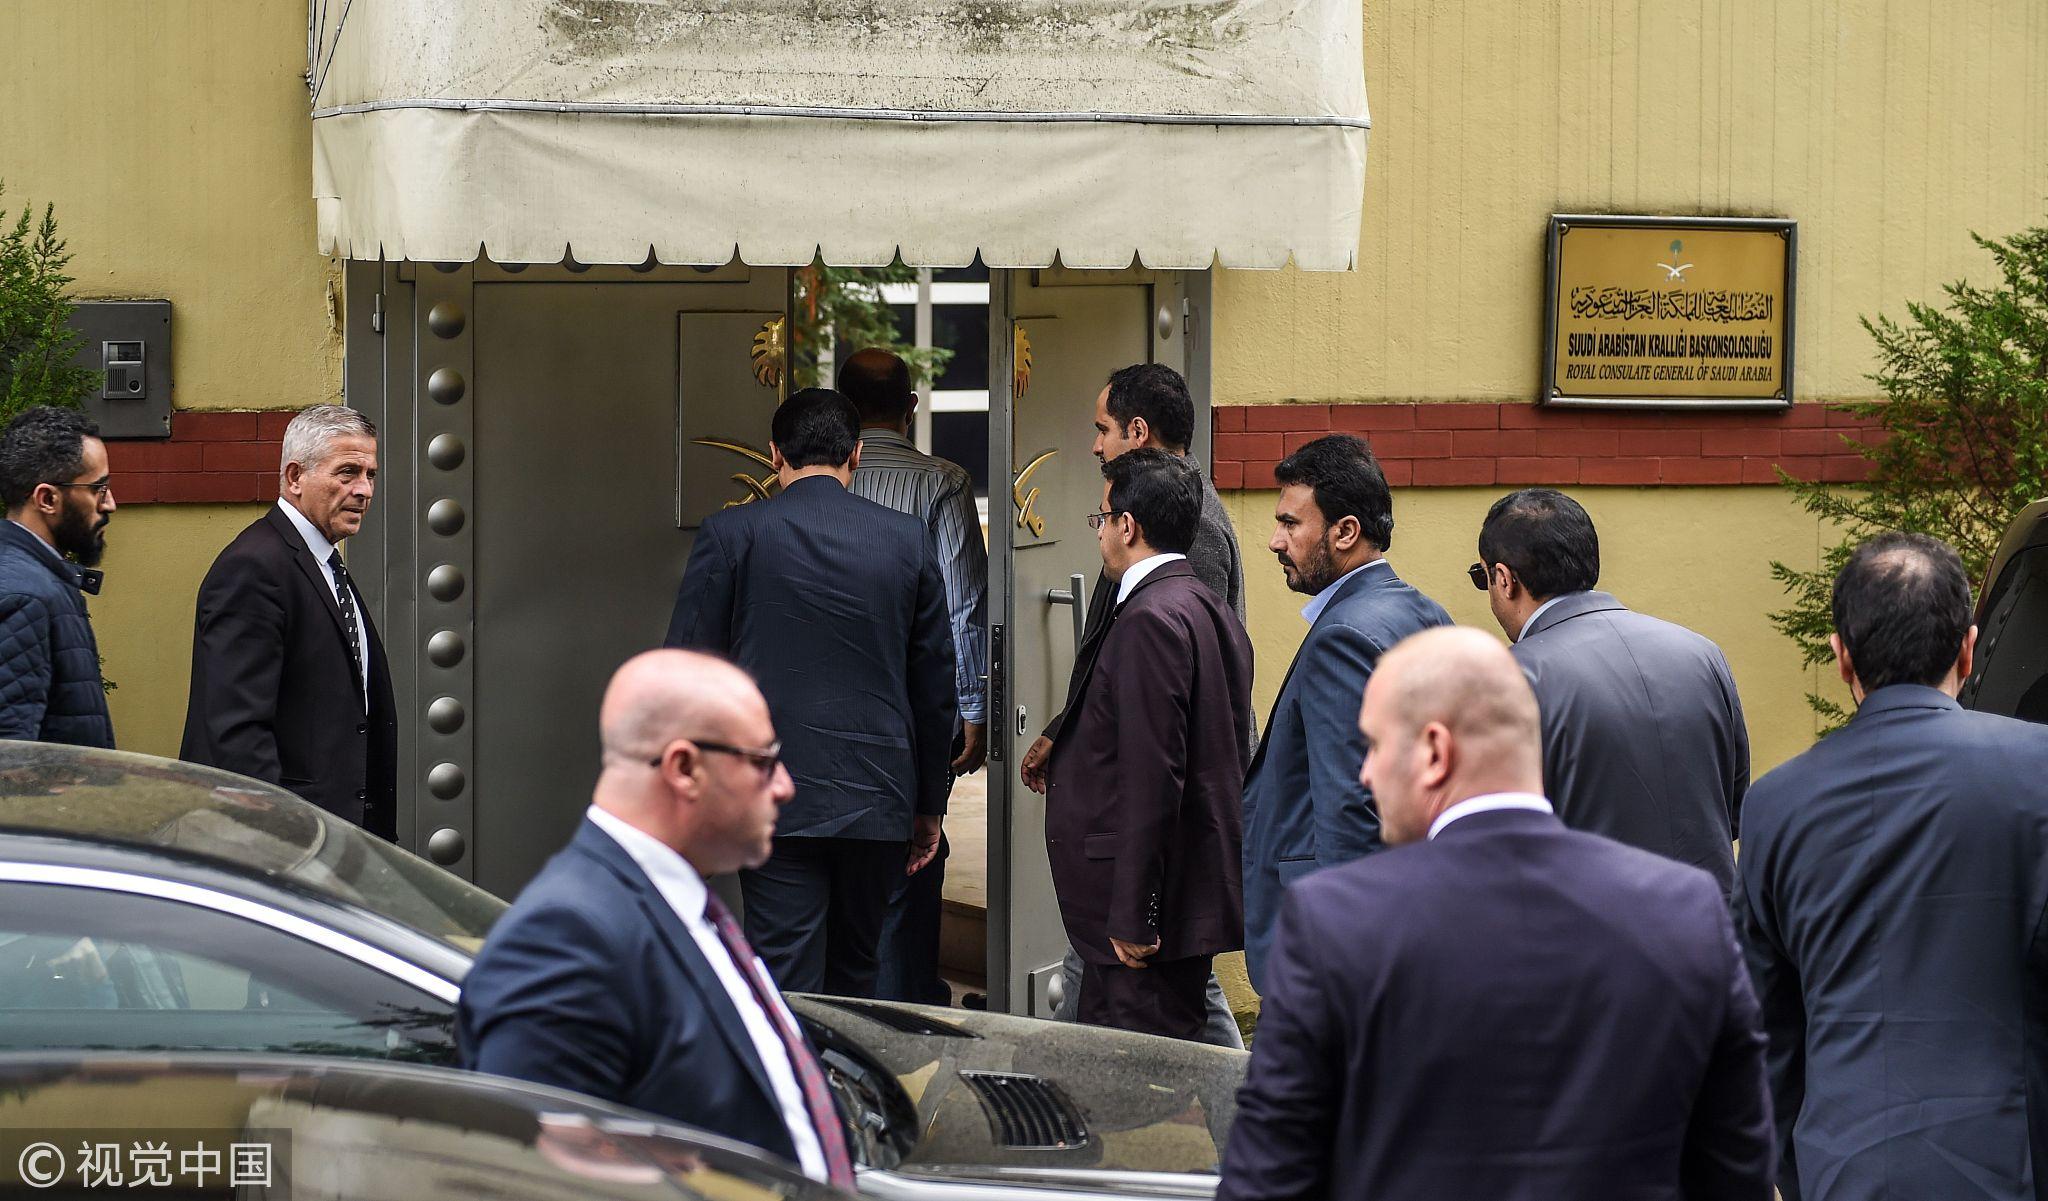 Turkey says will search consulate where Saudi journalist vanished - CGTN